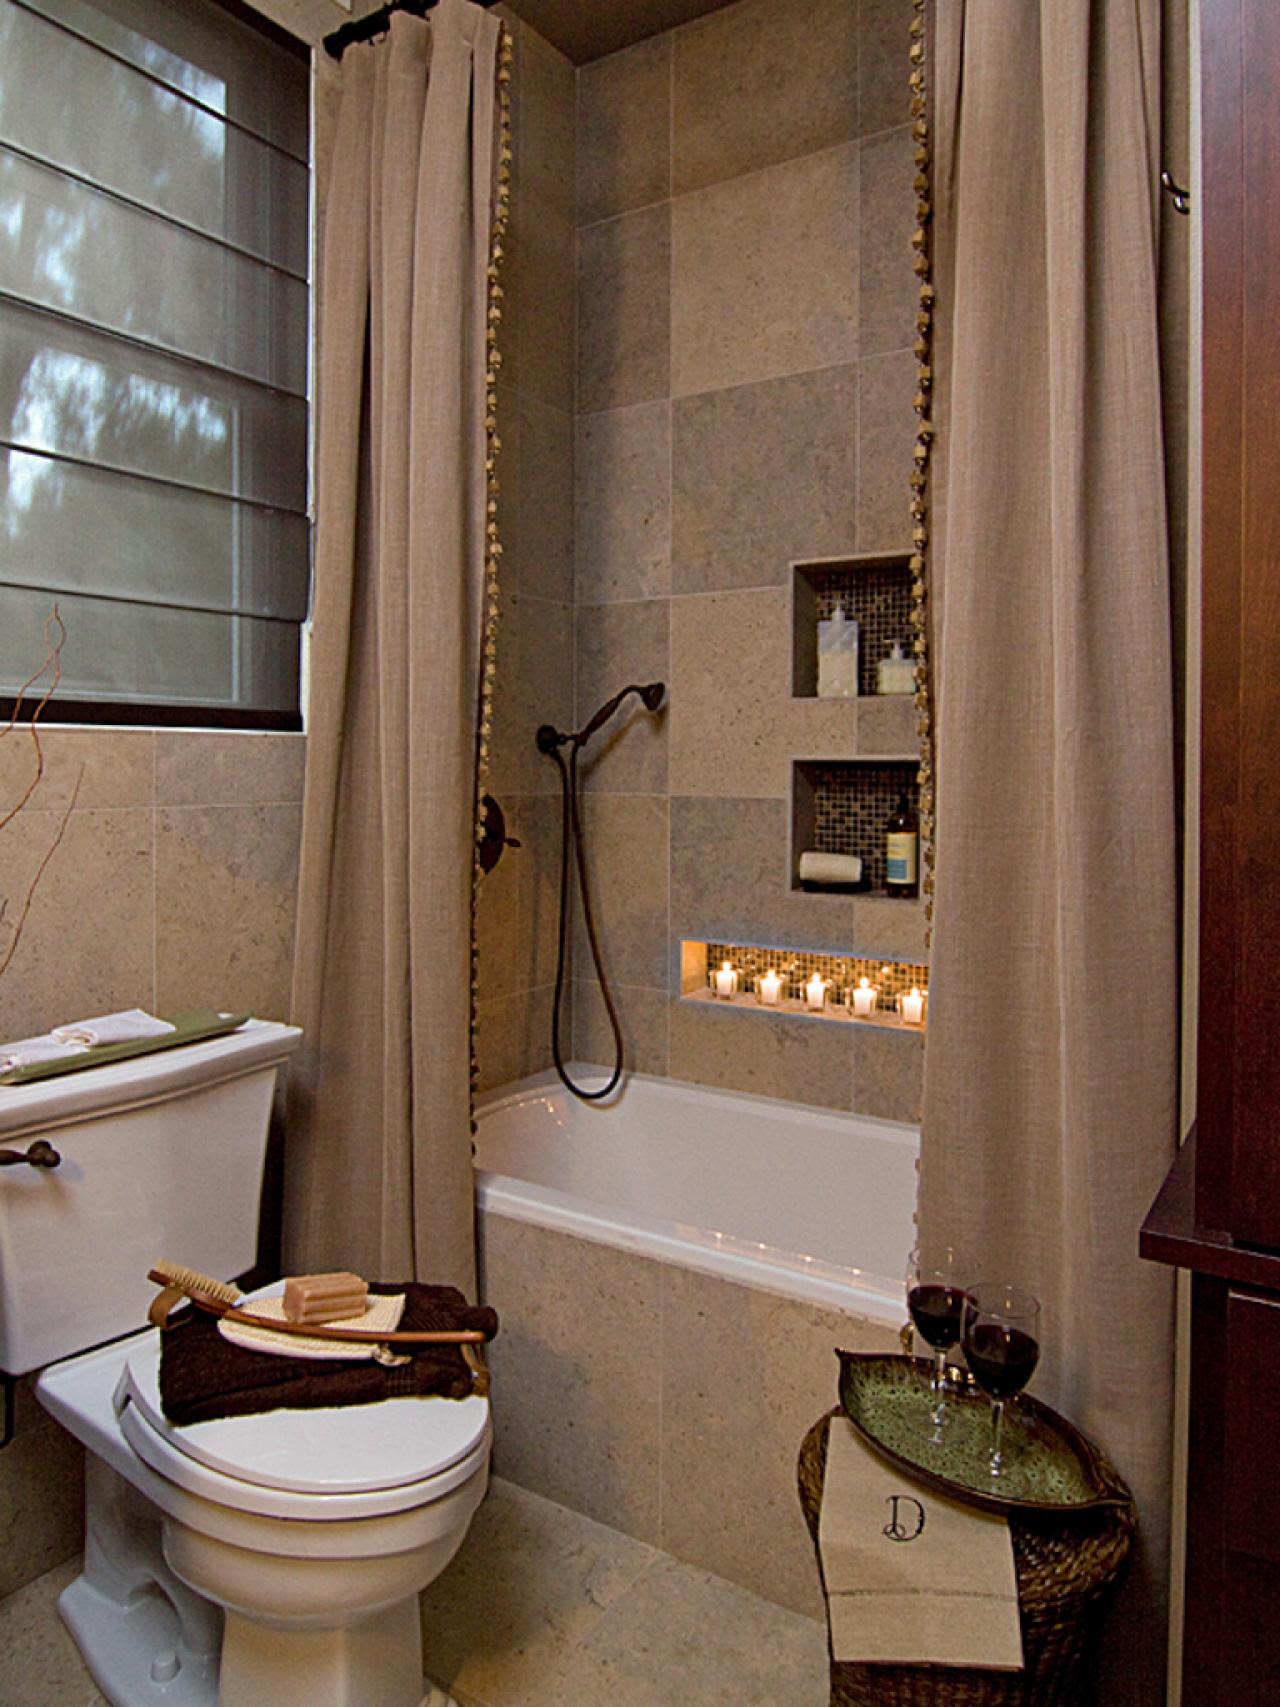 Small Bathroom Decorating Ideas | Bathroom Ideas & Designs ...